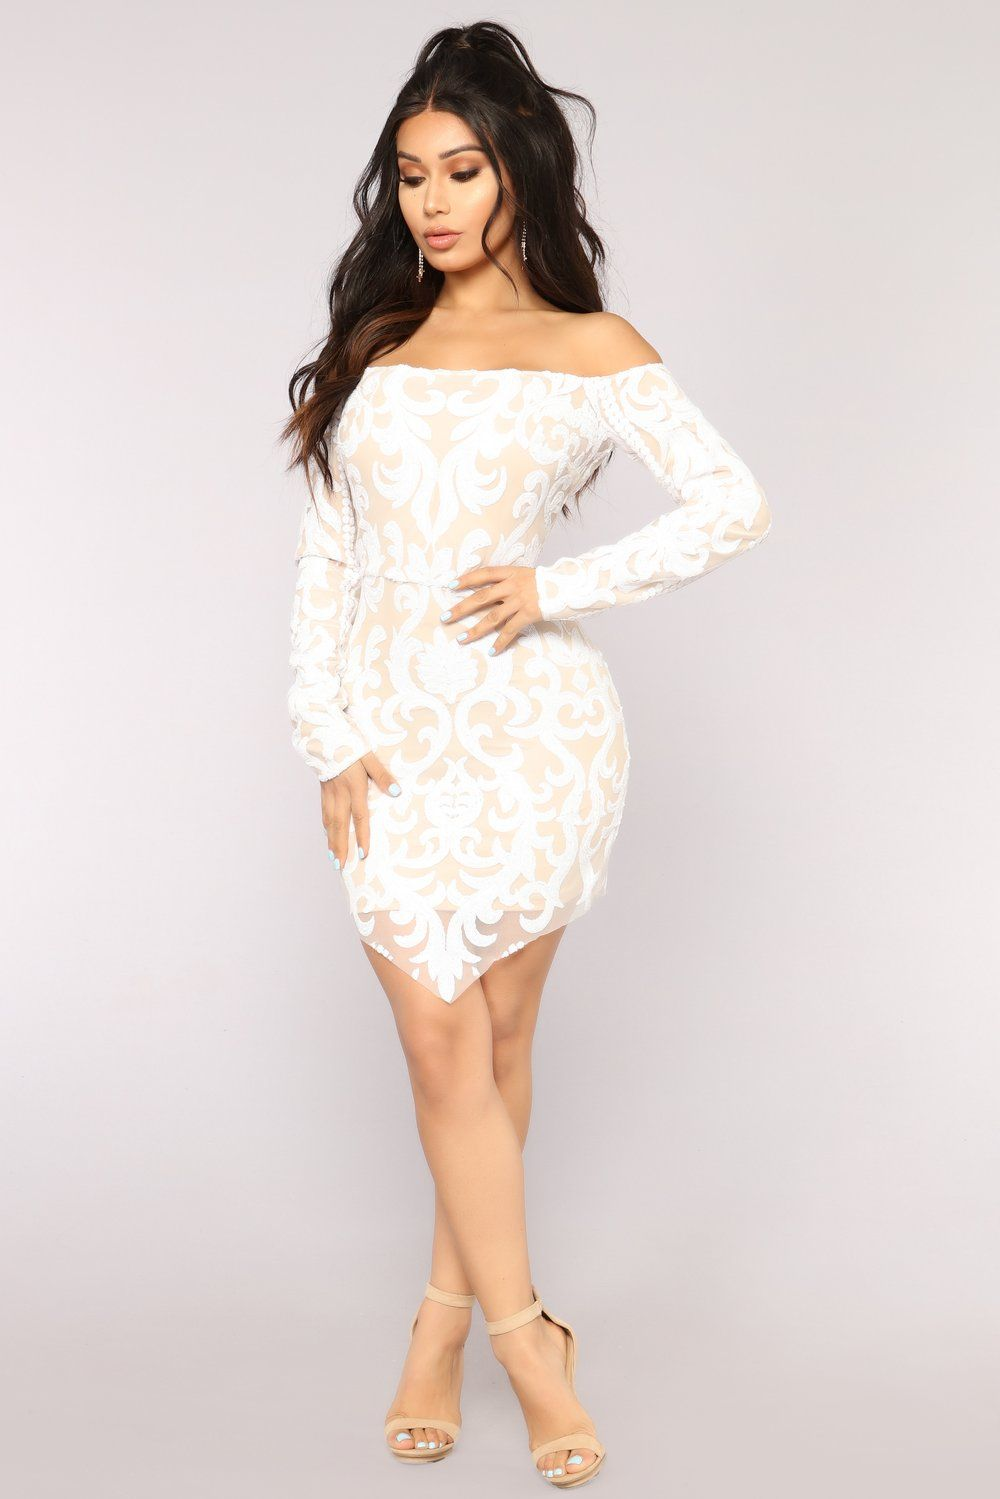 Throw Shine Not Shade Sequin Dress White Dresses Long Sequin Dress White Sequin Dress [ 1499 x 1000 Pixel ]